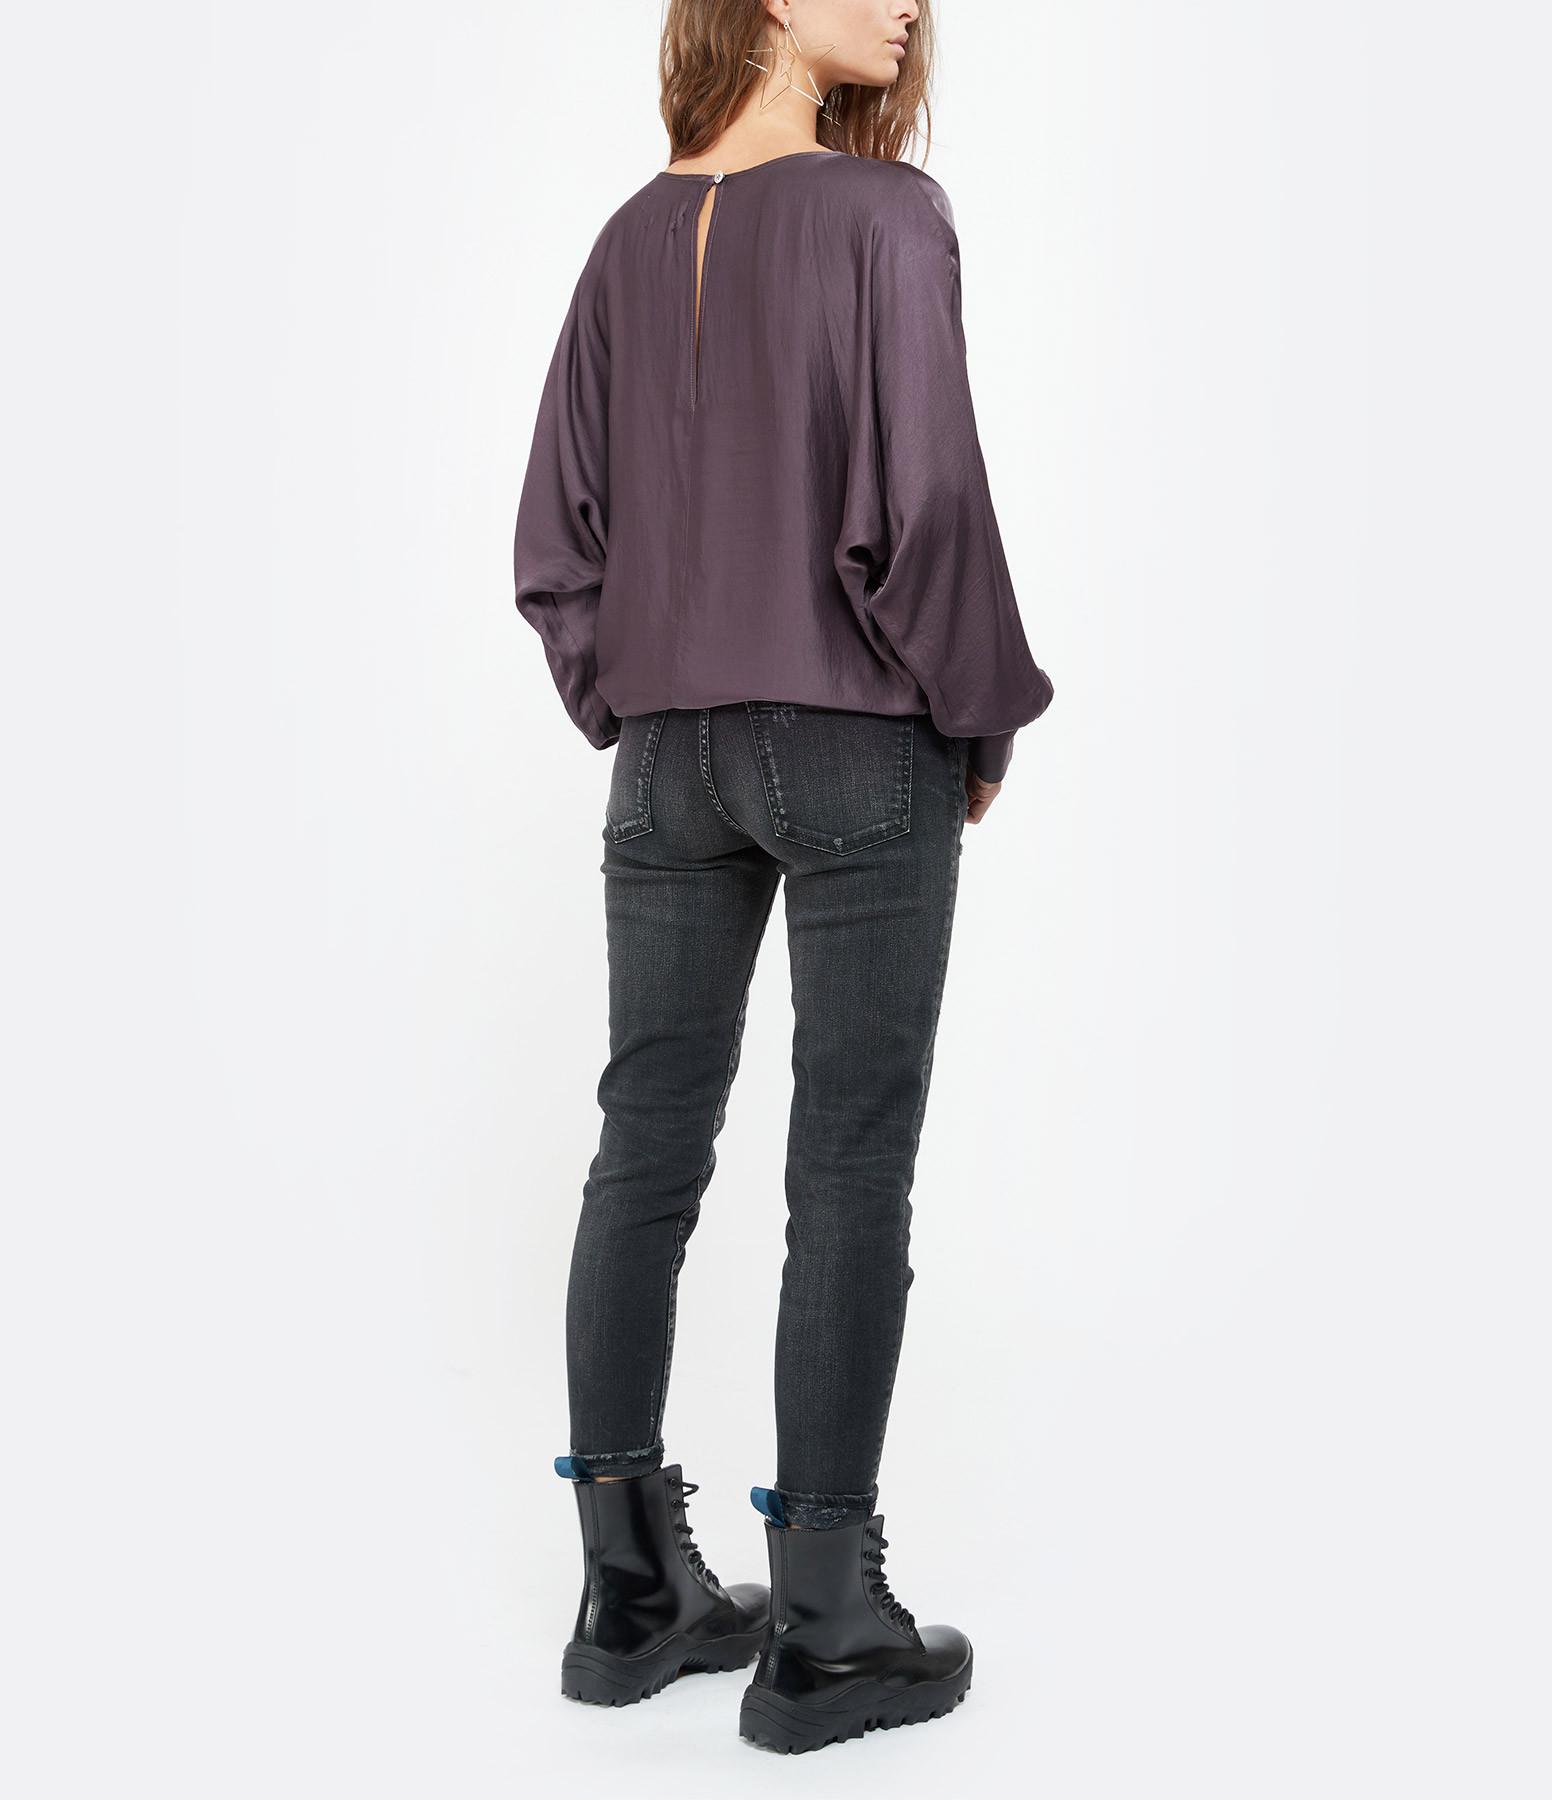 MOUSSY VINTAGE - Jean Velma Skinny Coton Denim Noir